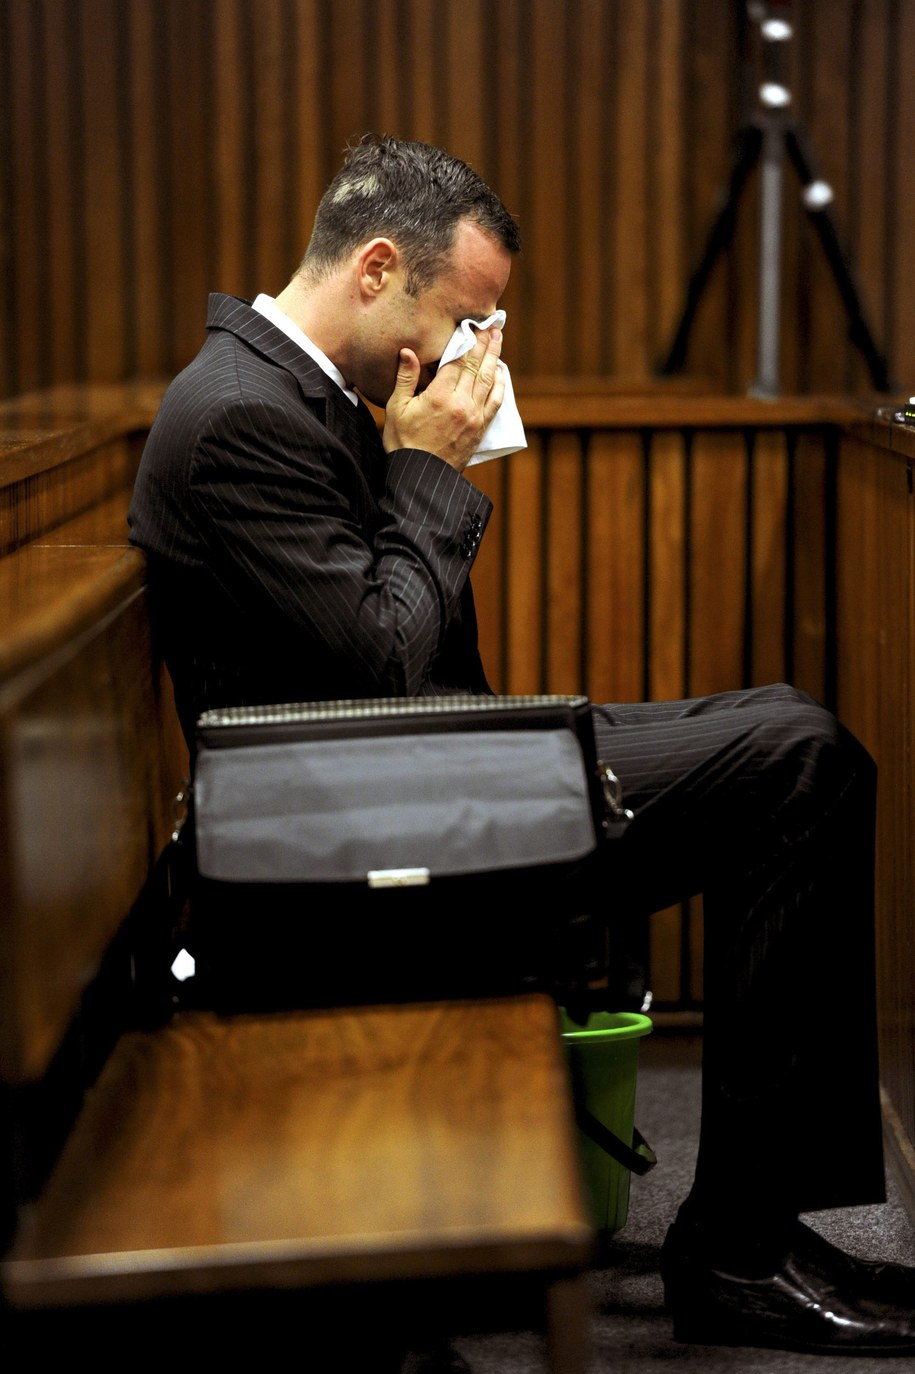 Oscar Pistorius /WERNER BEUKES /PAP/EPA